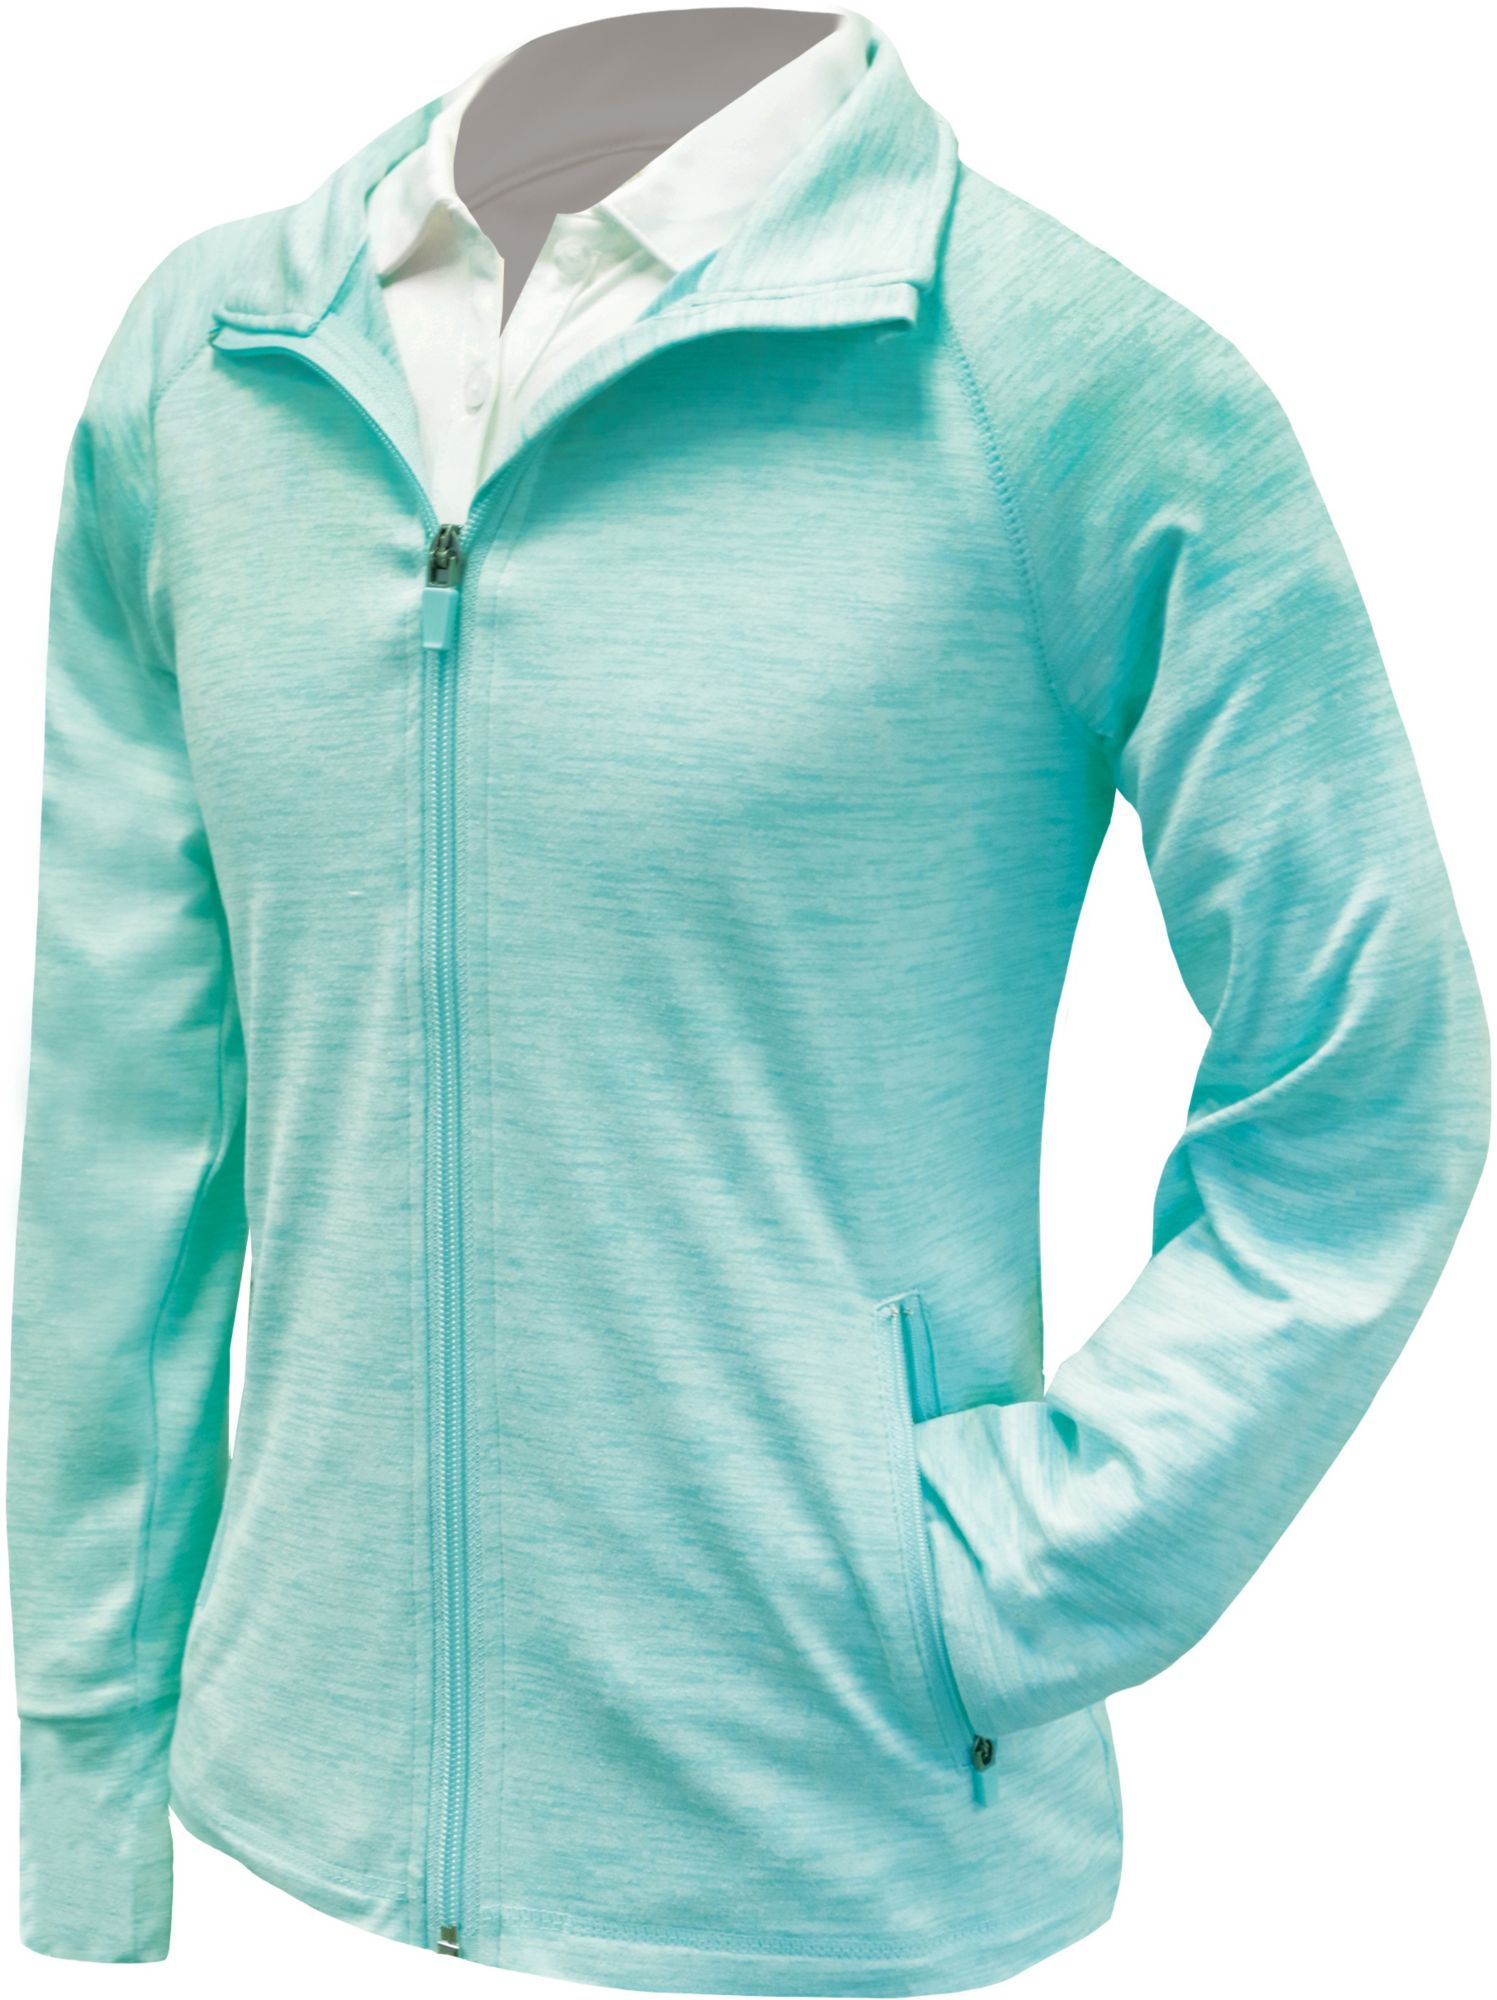 Garb Girls Jordan Golf Jacket Size Small Blue Golf Jackets Golf Outfit Jackets